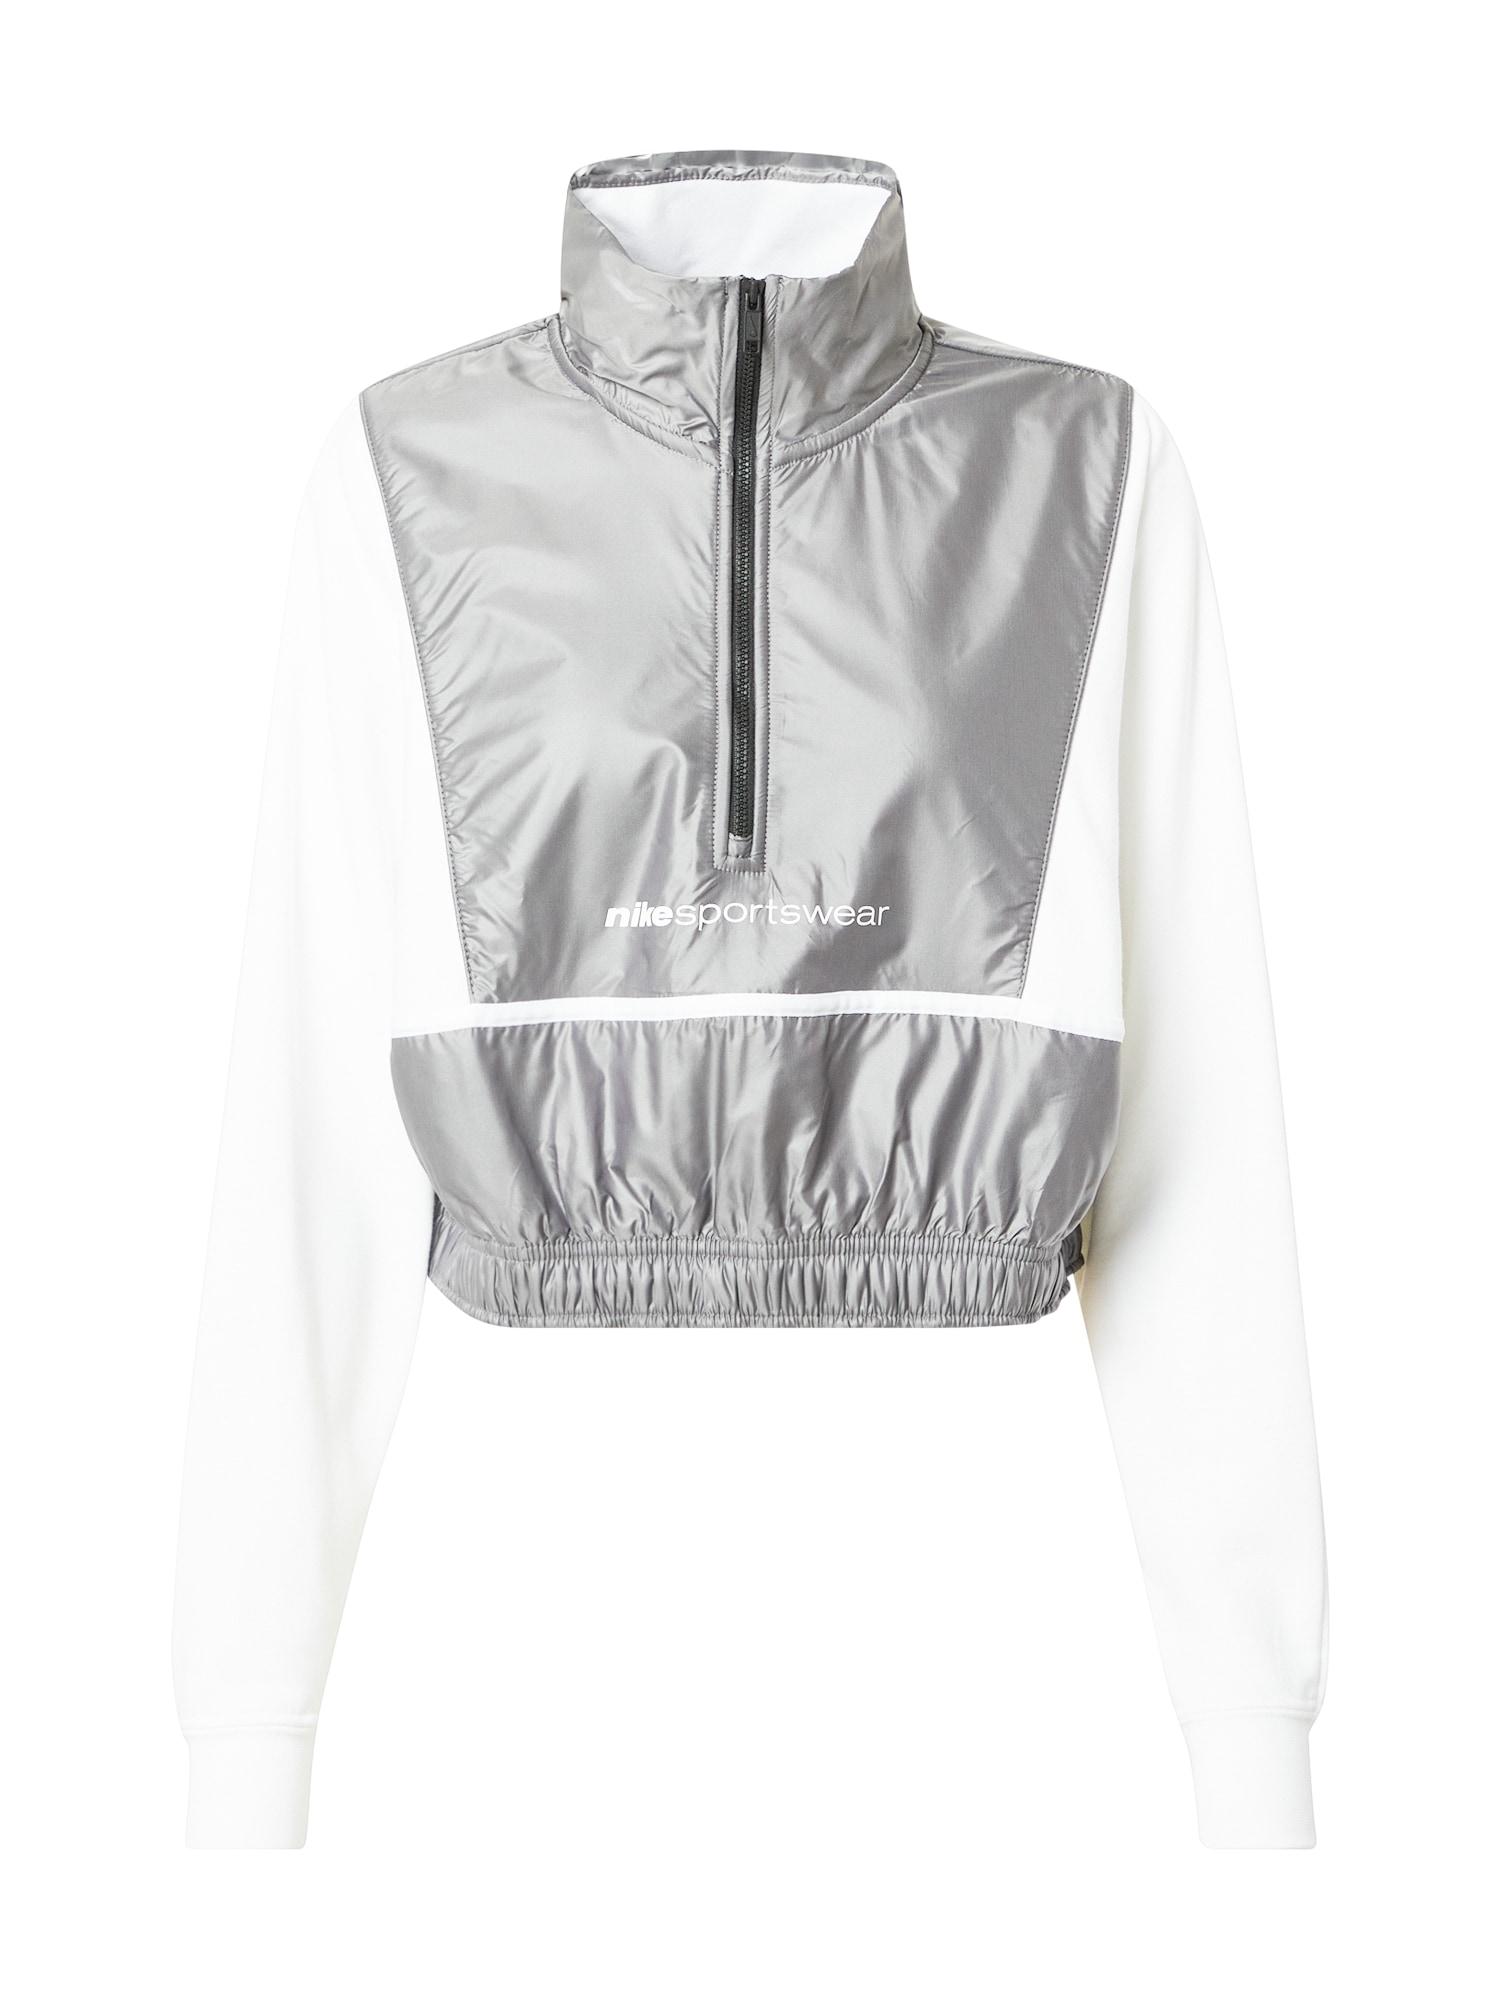 Nike Sportswear Megztinis be užsegimo 'ARCHIVE RMX' balta / sidabro pilka